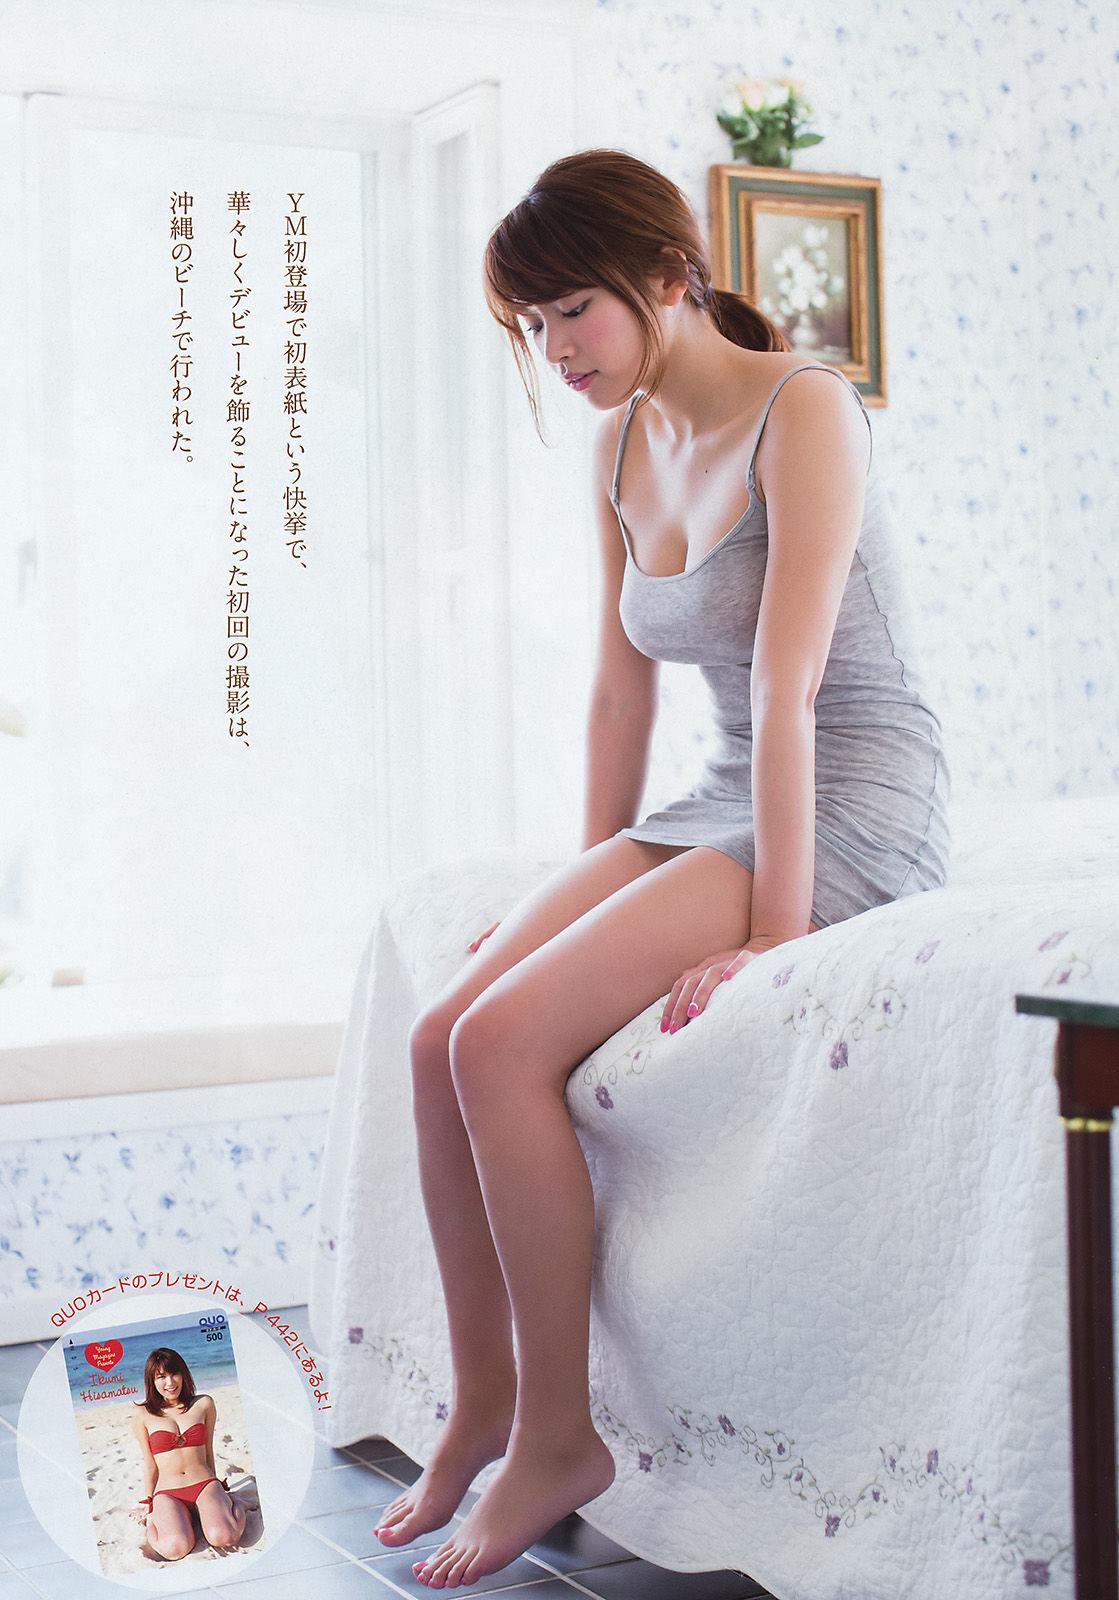 VOL.576 [Young Magazine]大胸阳光:久松郁实(久松郁実)超高清写真套图(11P)